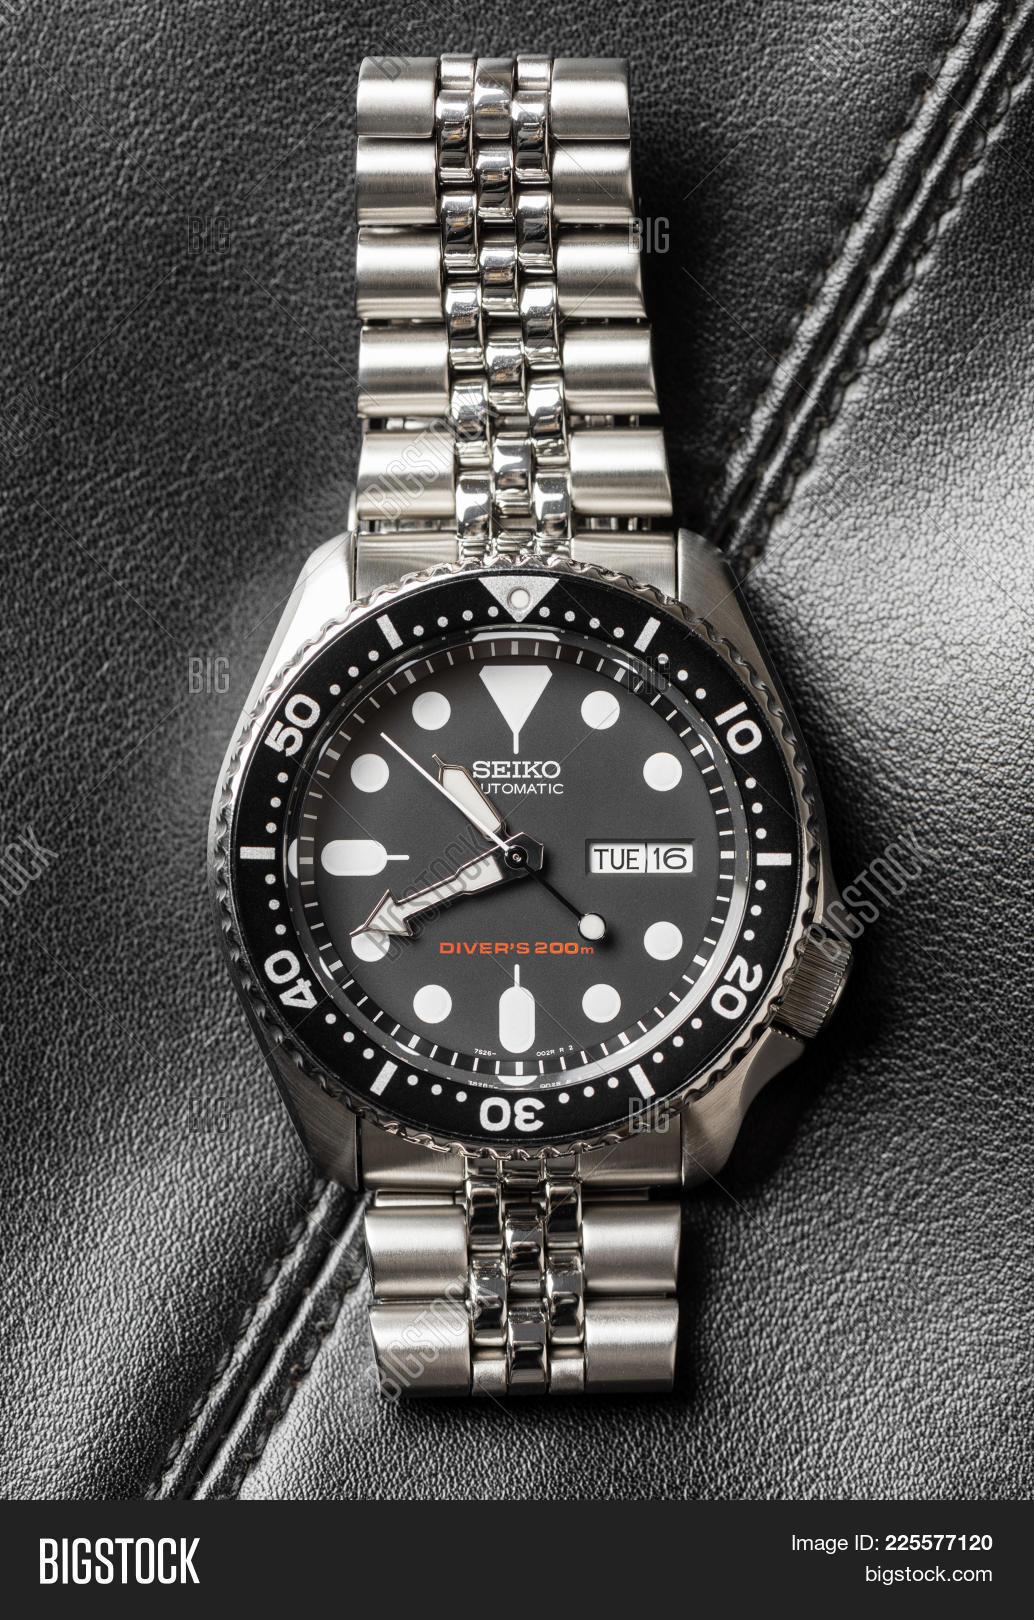 Seiko Automatic Image Photo Free Trial Bigstock Skx007k2 Divers 200m Black Dial